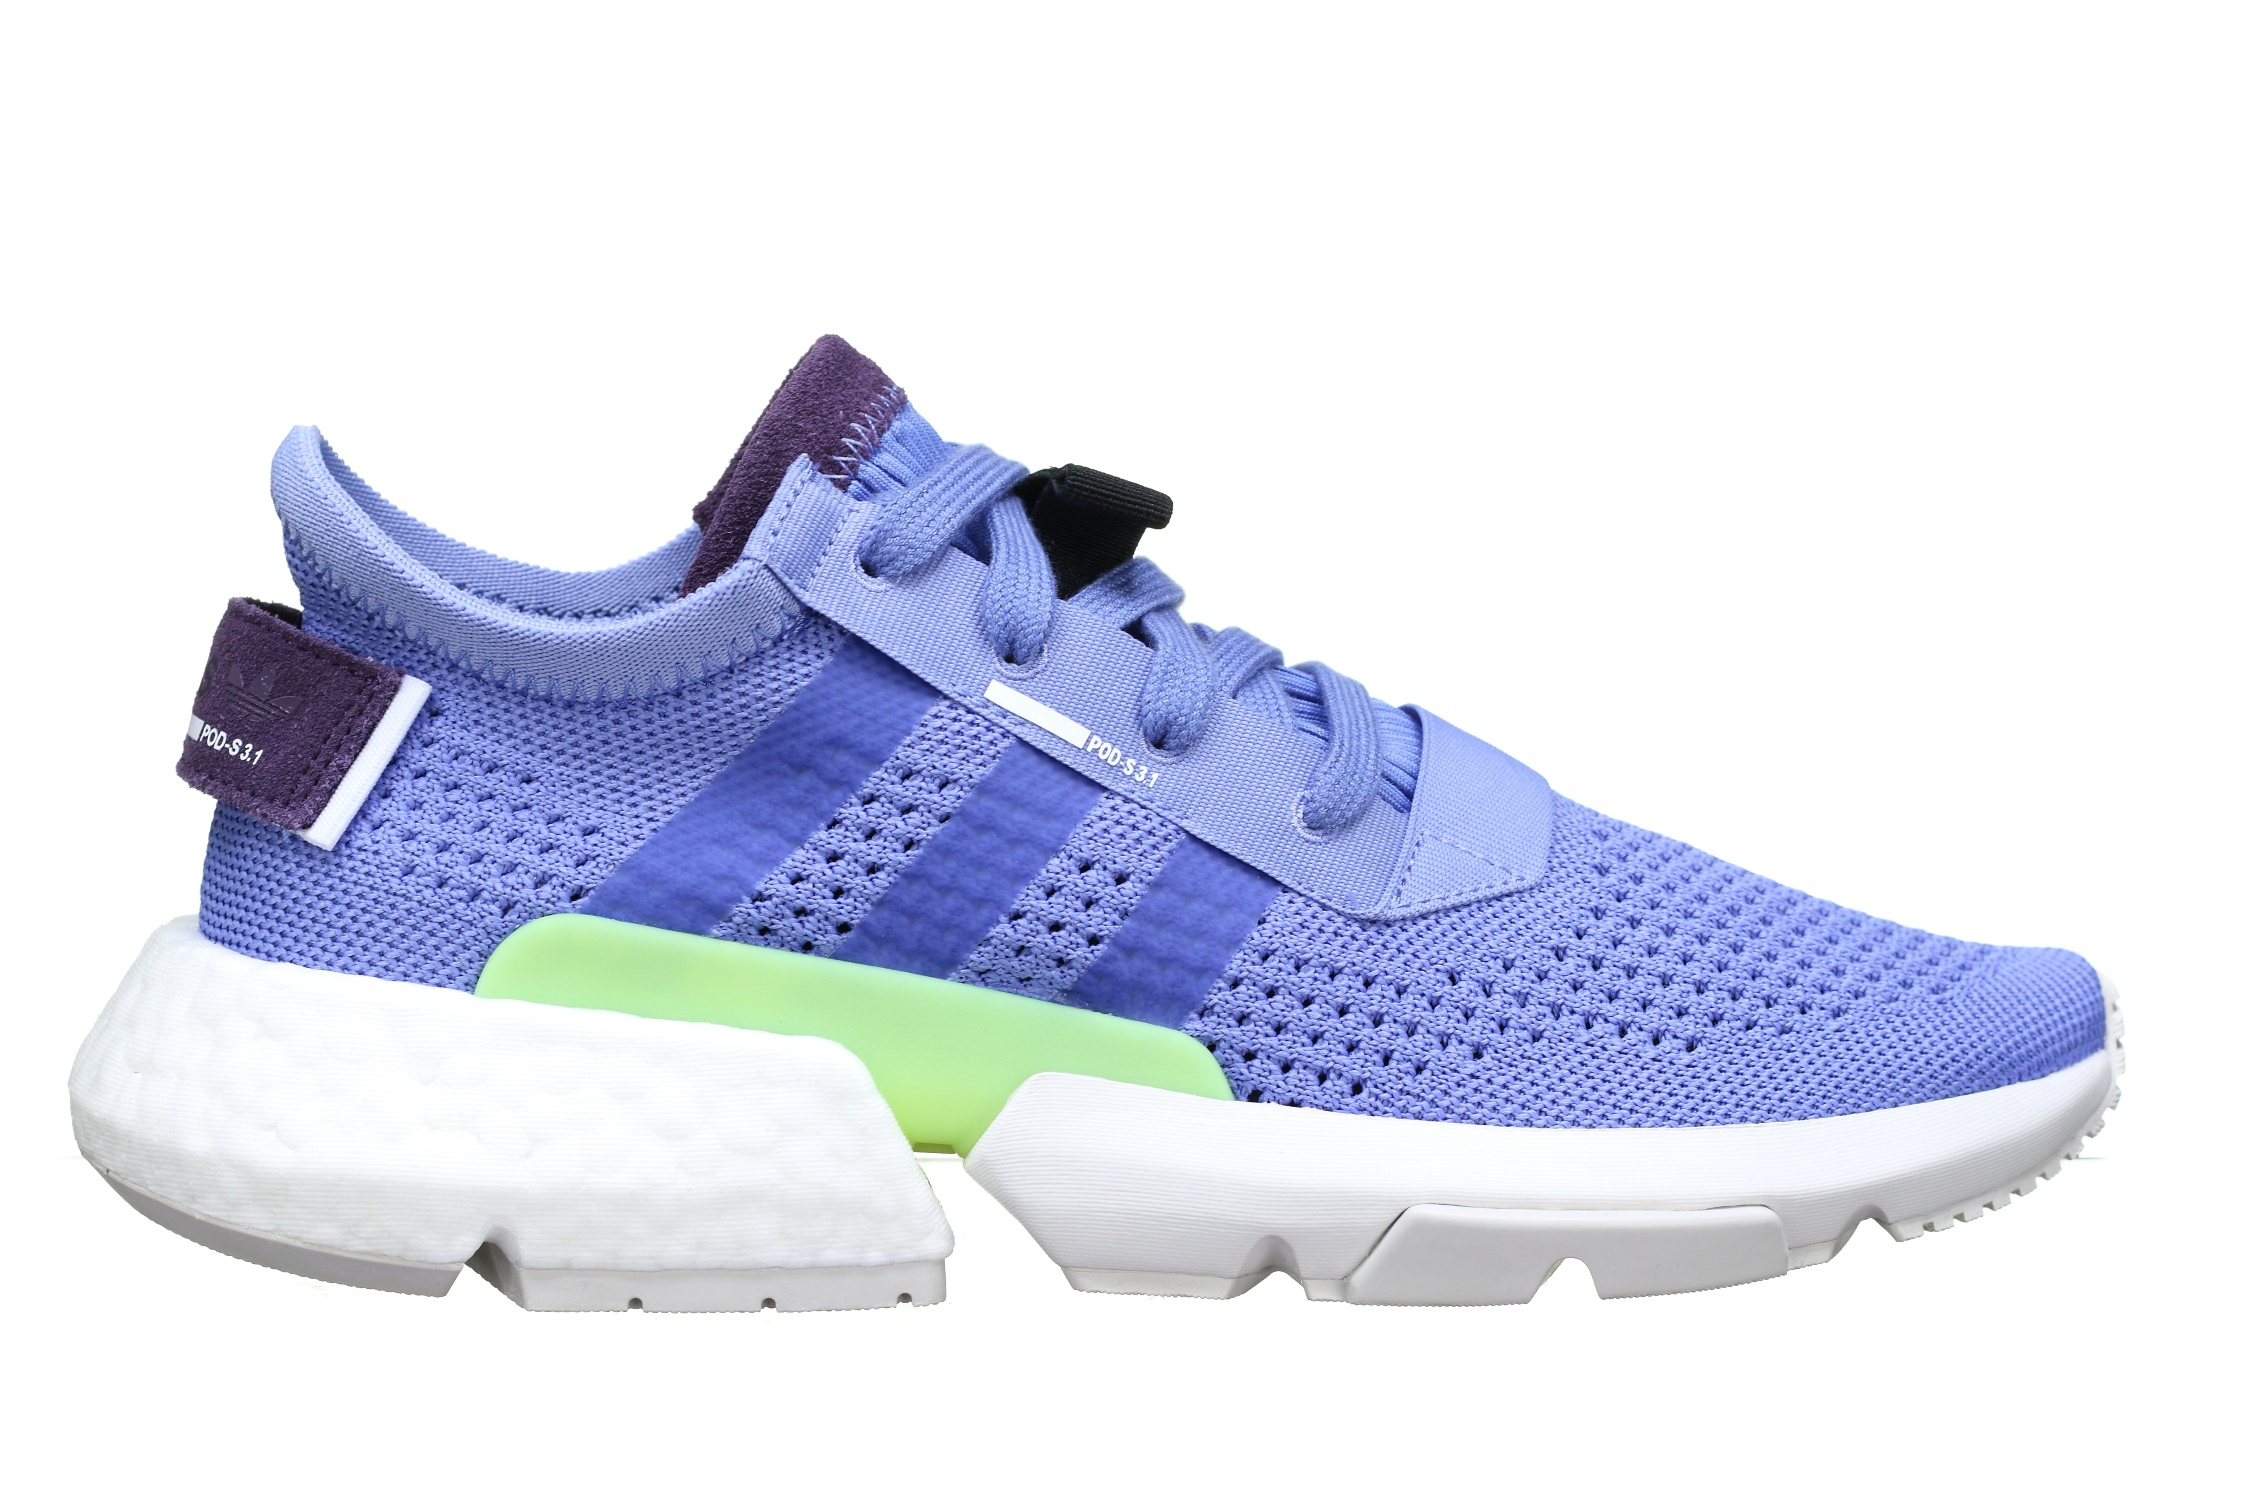 https://www.leadermode.com/165685/adidas-pod-s31-db3539-bleu.jpg